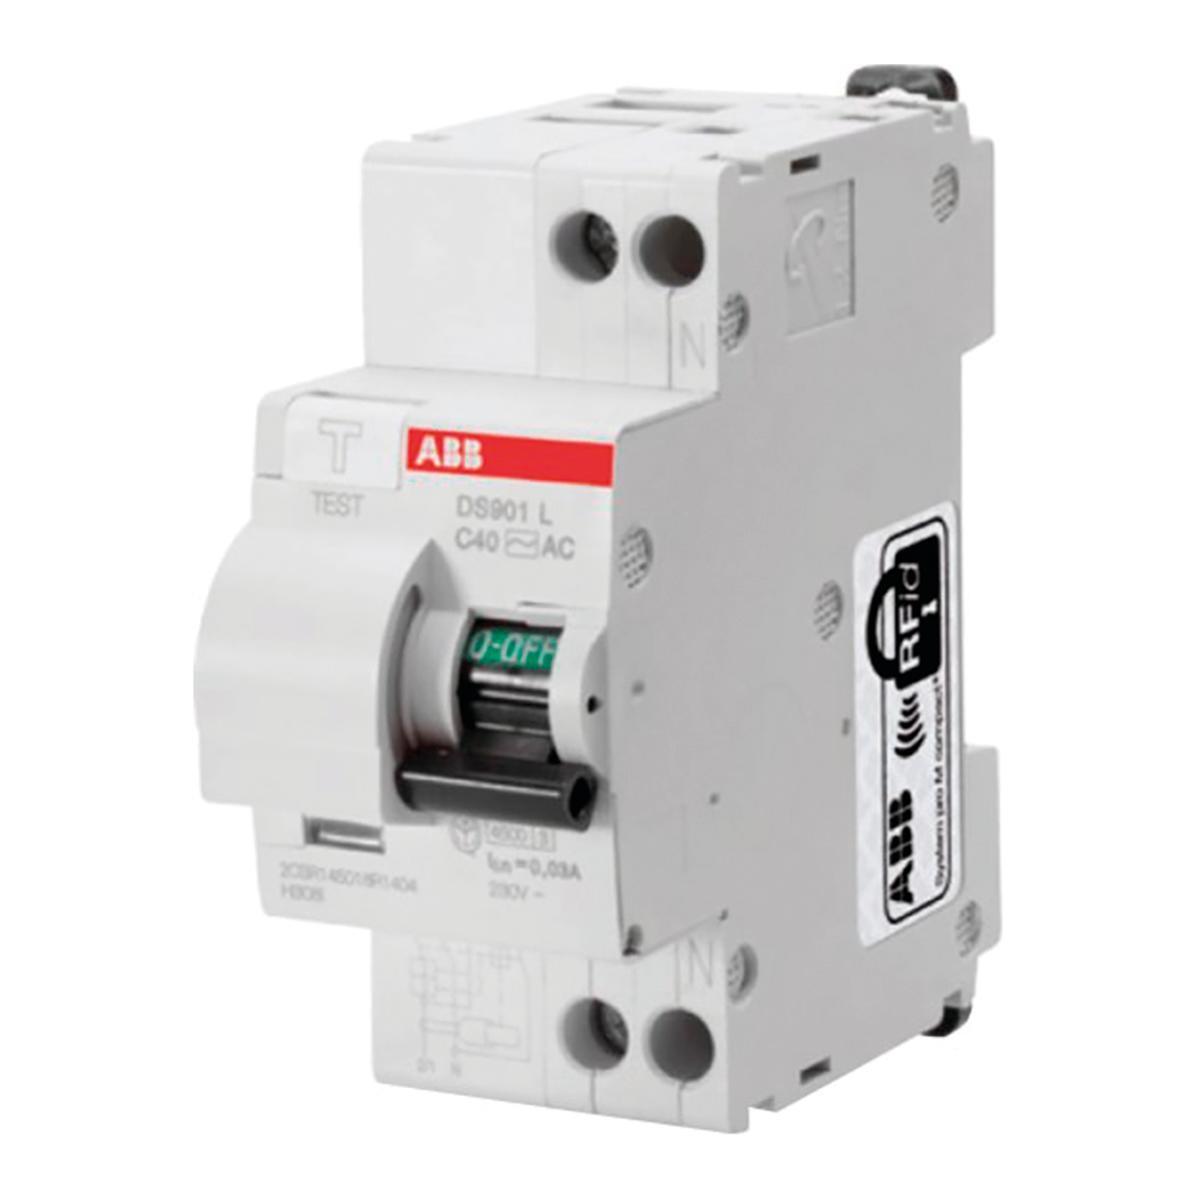 Kit Interruttore magnetotermico differenziale ABB DS 901 1 polo 25A 4.5kA 30mA AC 2 moduli 230V, 5 pezzi - 2